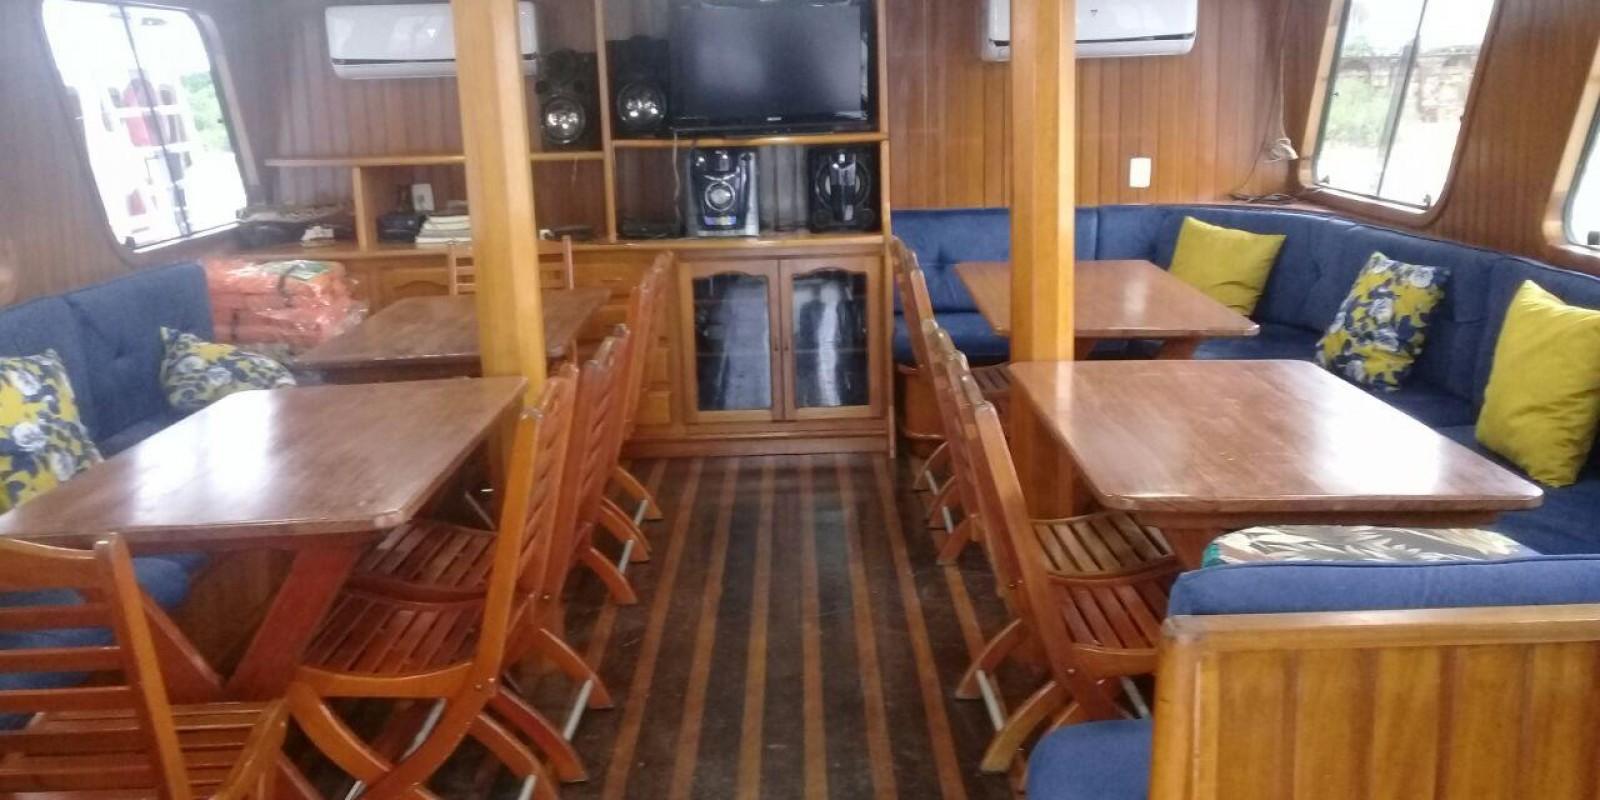 Barco Hotel Maruaga / Manaus - Foto 5 de 5